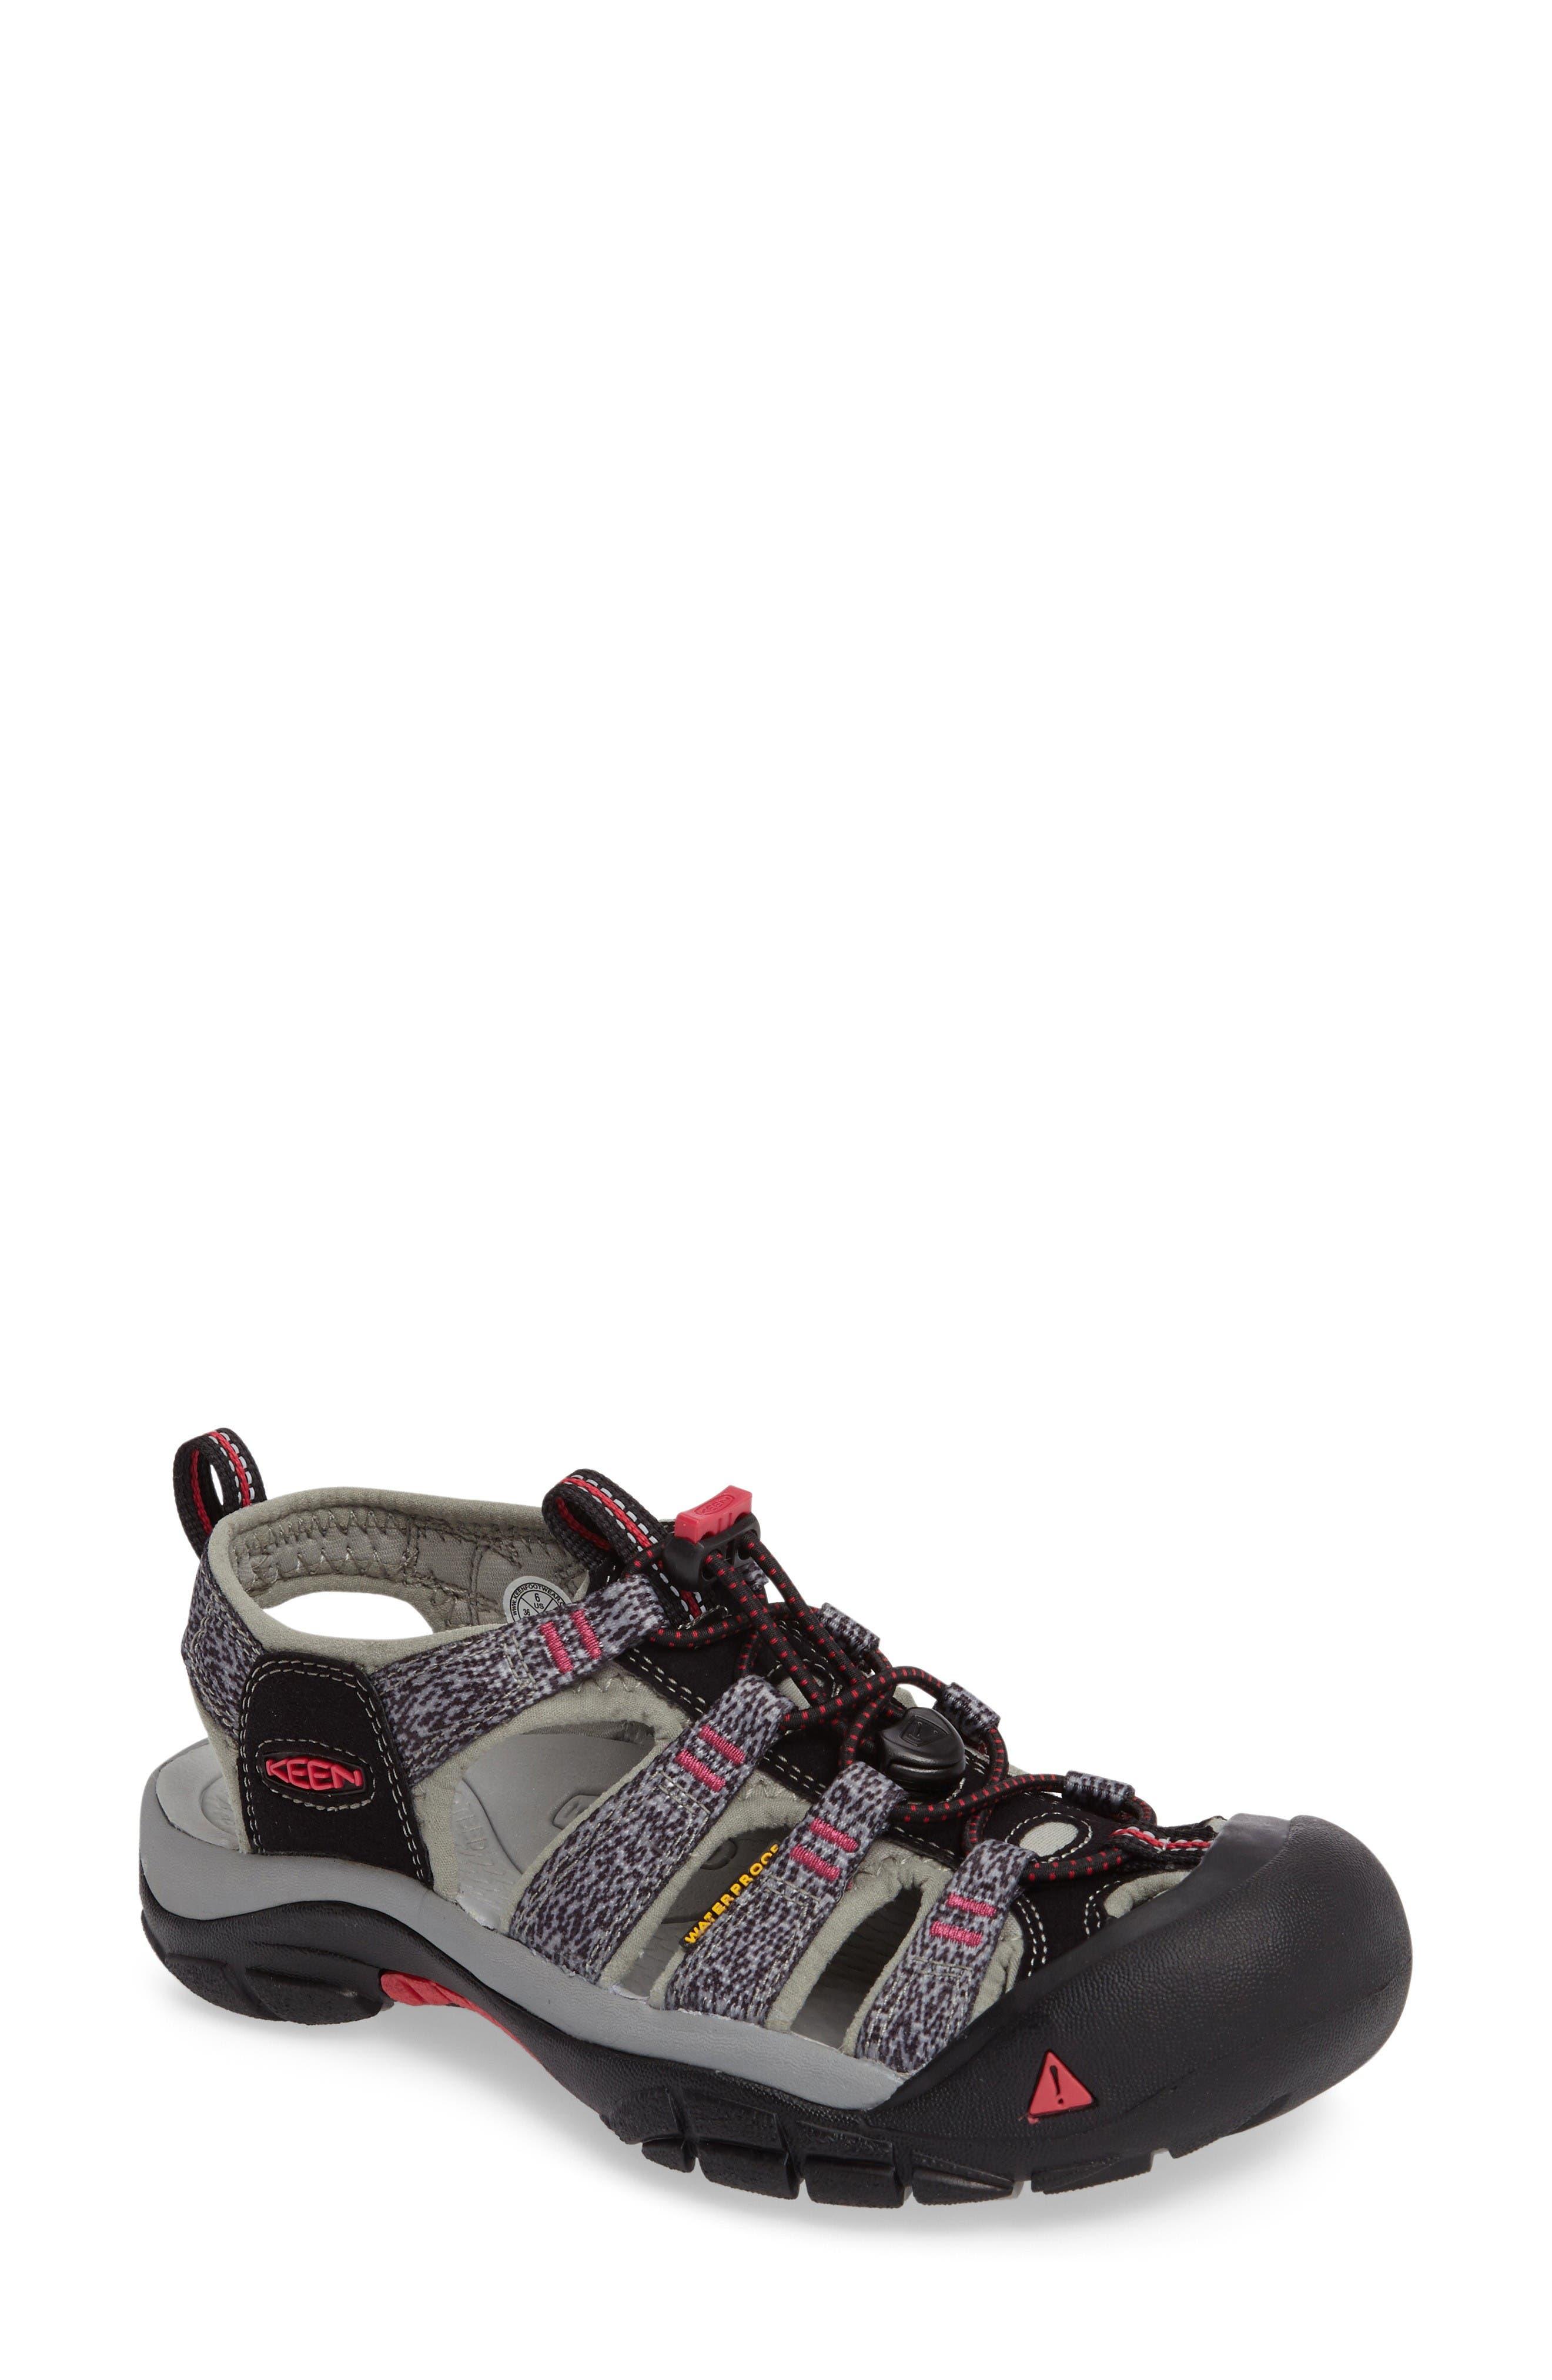 'Newport H2' Sandal,                             Main thumbnail 1, color,                             Black/ Bright Rose Fabric